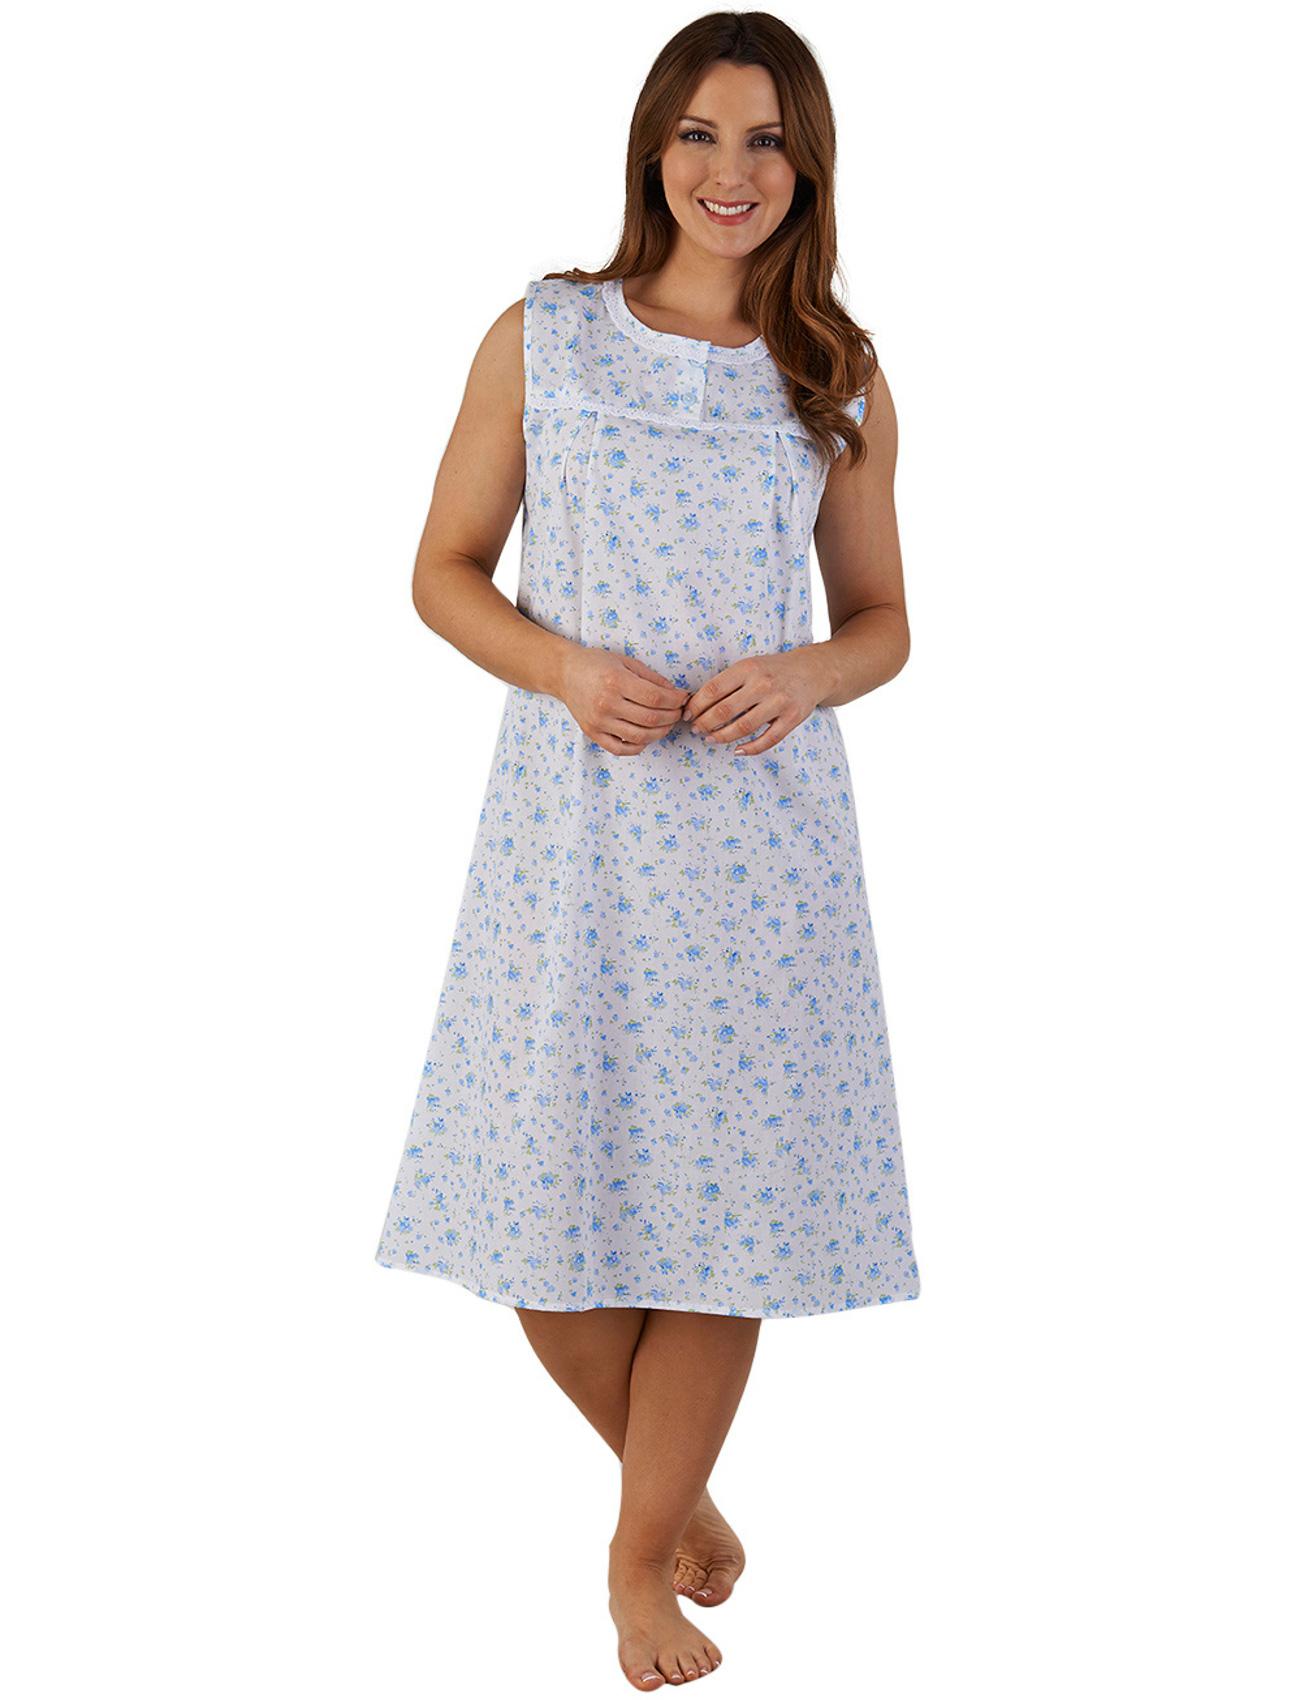 a2db8be1fb Womens Night Dress Floral Sleeveless Slenderella Ladies Lace Trim Flower  Nighty